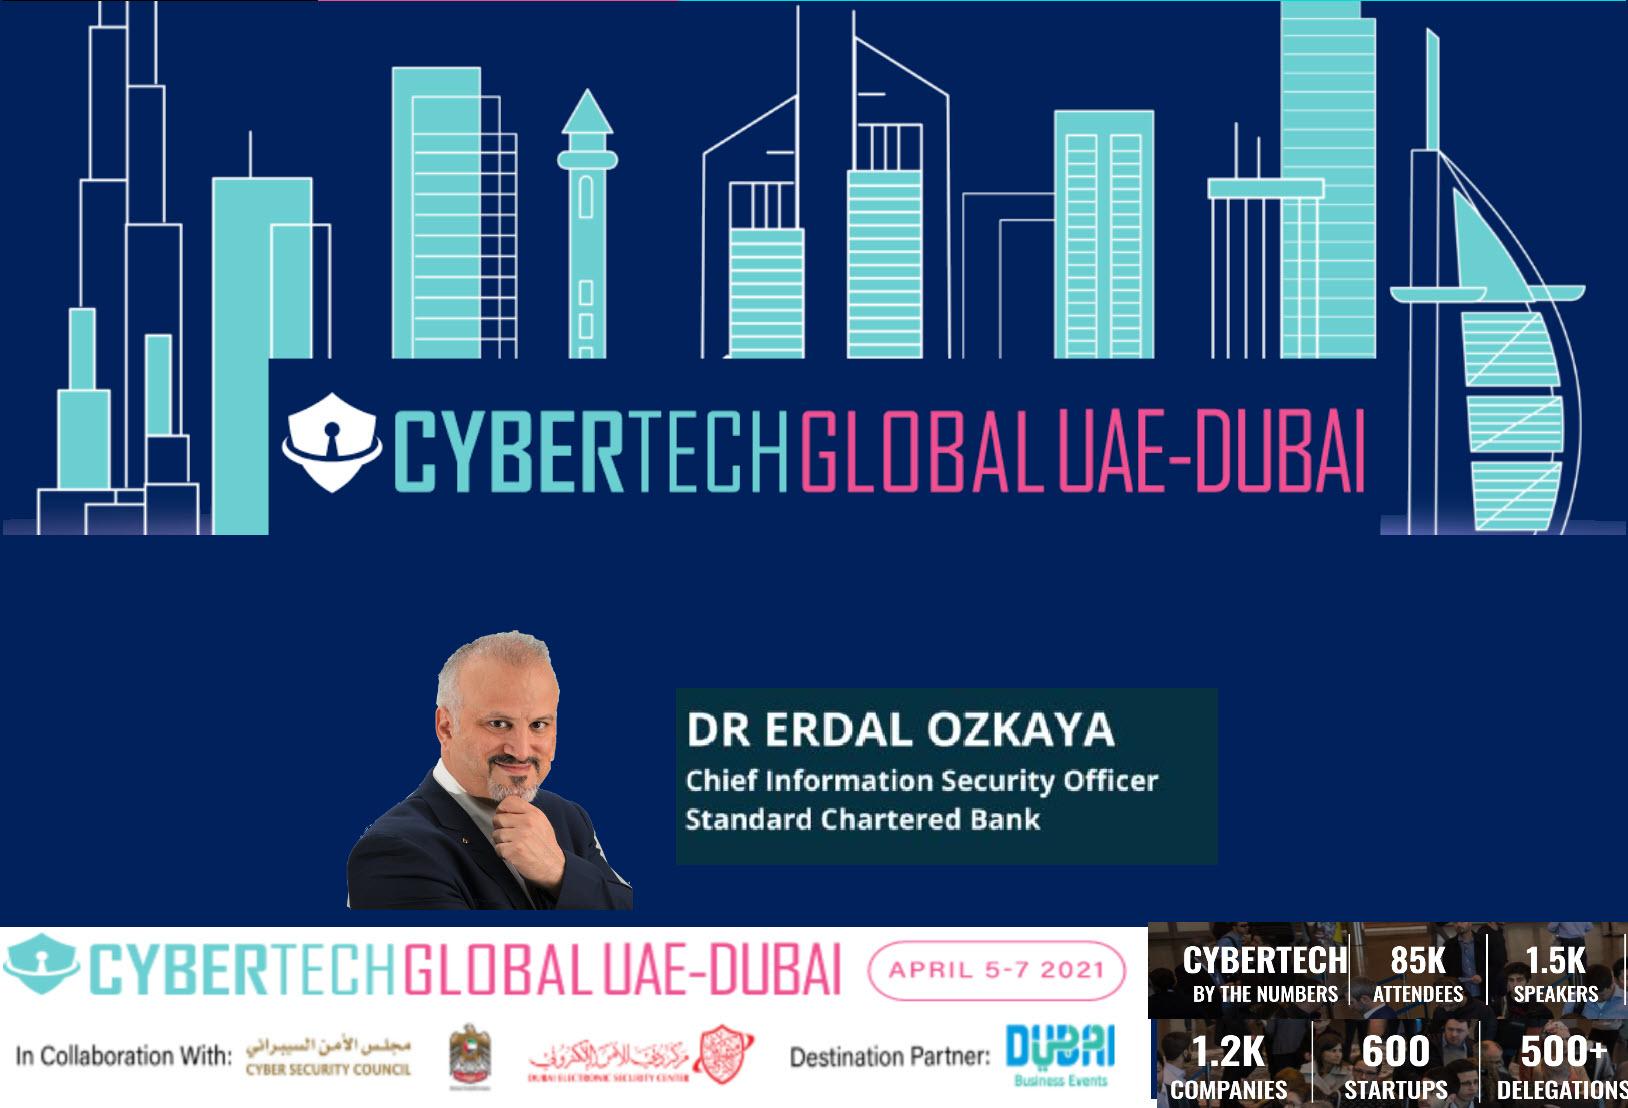 CyberTech Global Dr Erdal Ozkaya